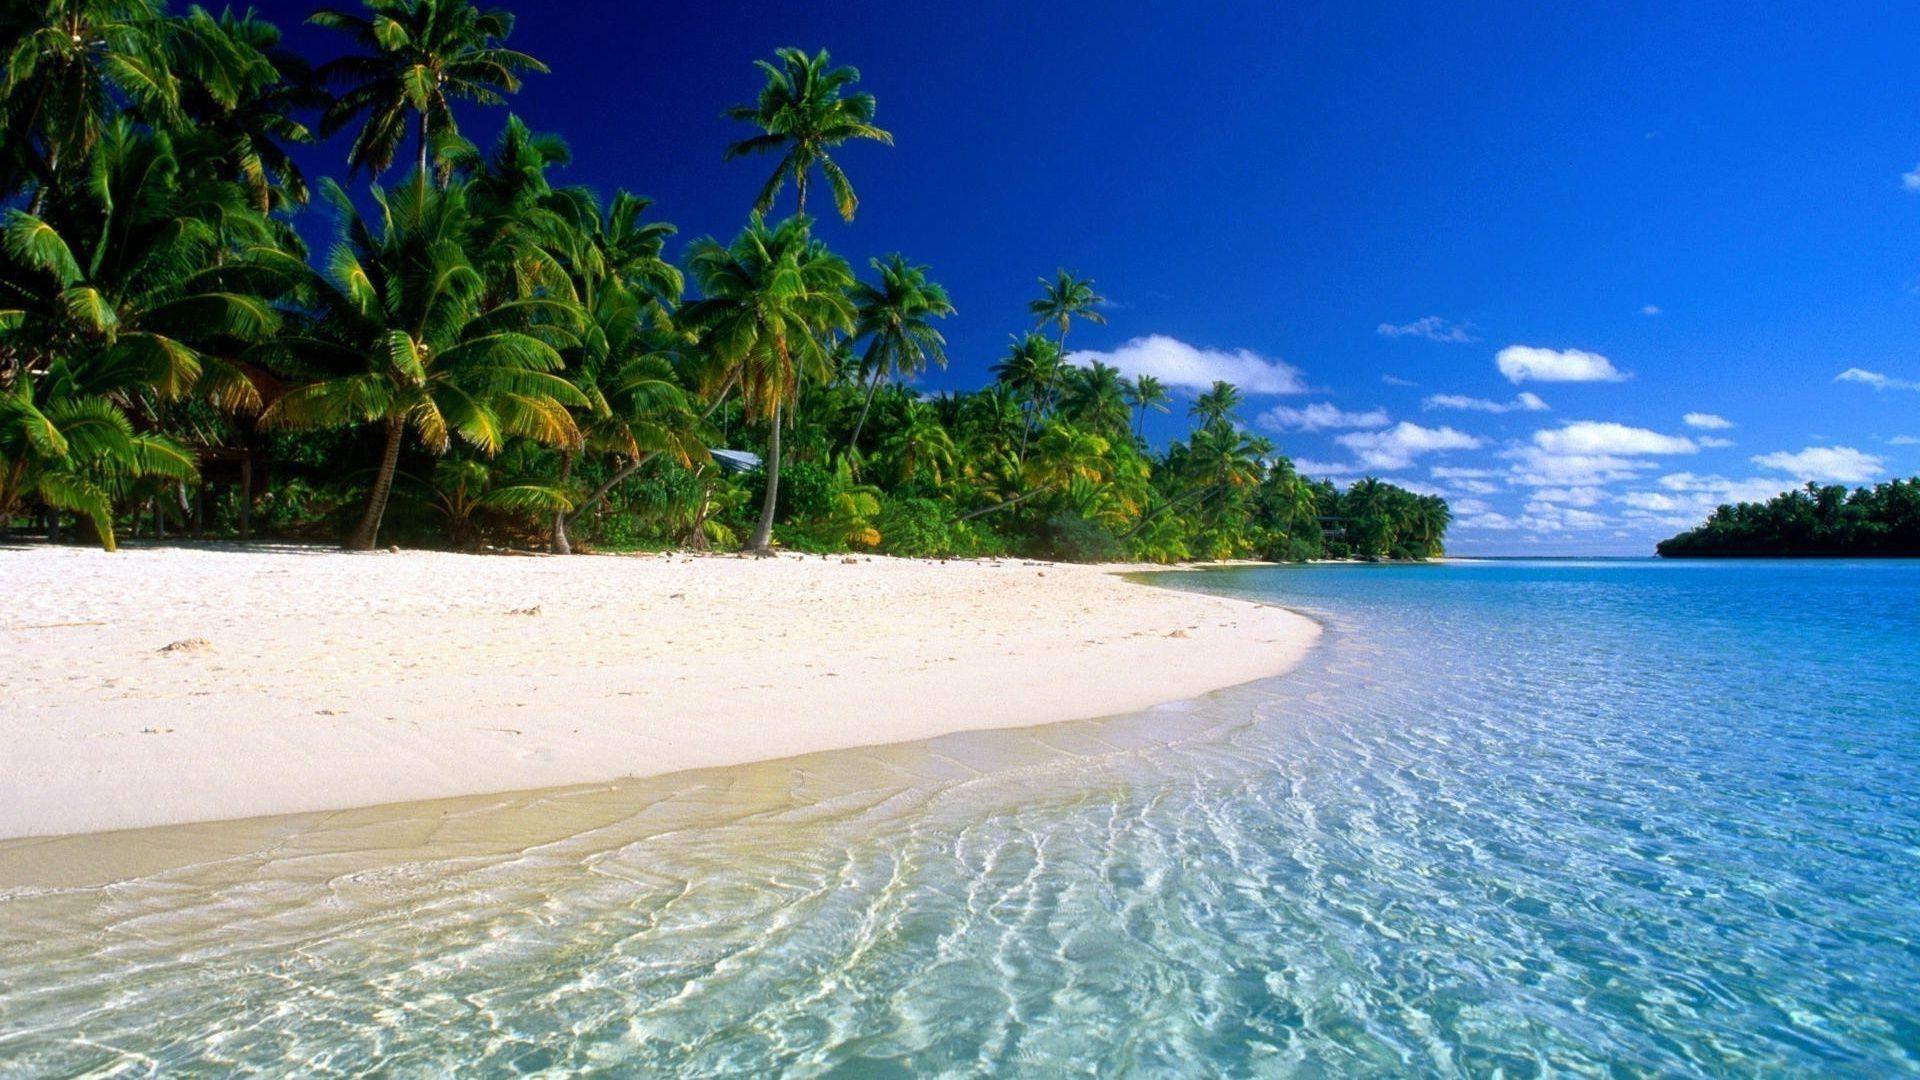 1920x1080 hd beach desktop wallpapers top free 1920x1080 - Beach hd wallpapers 1080p ...